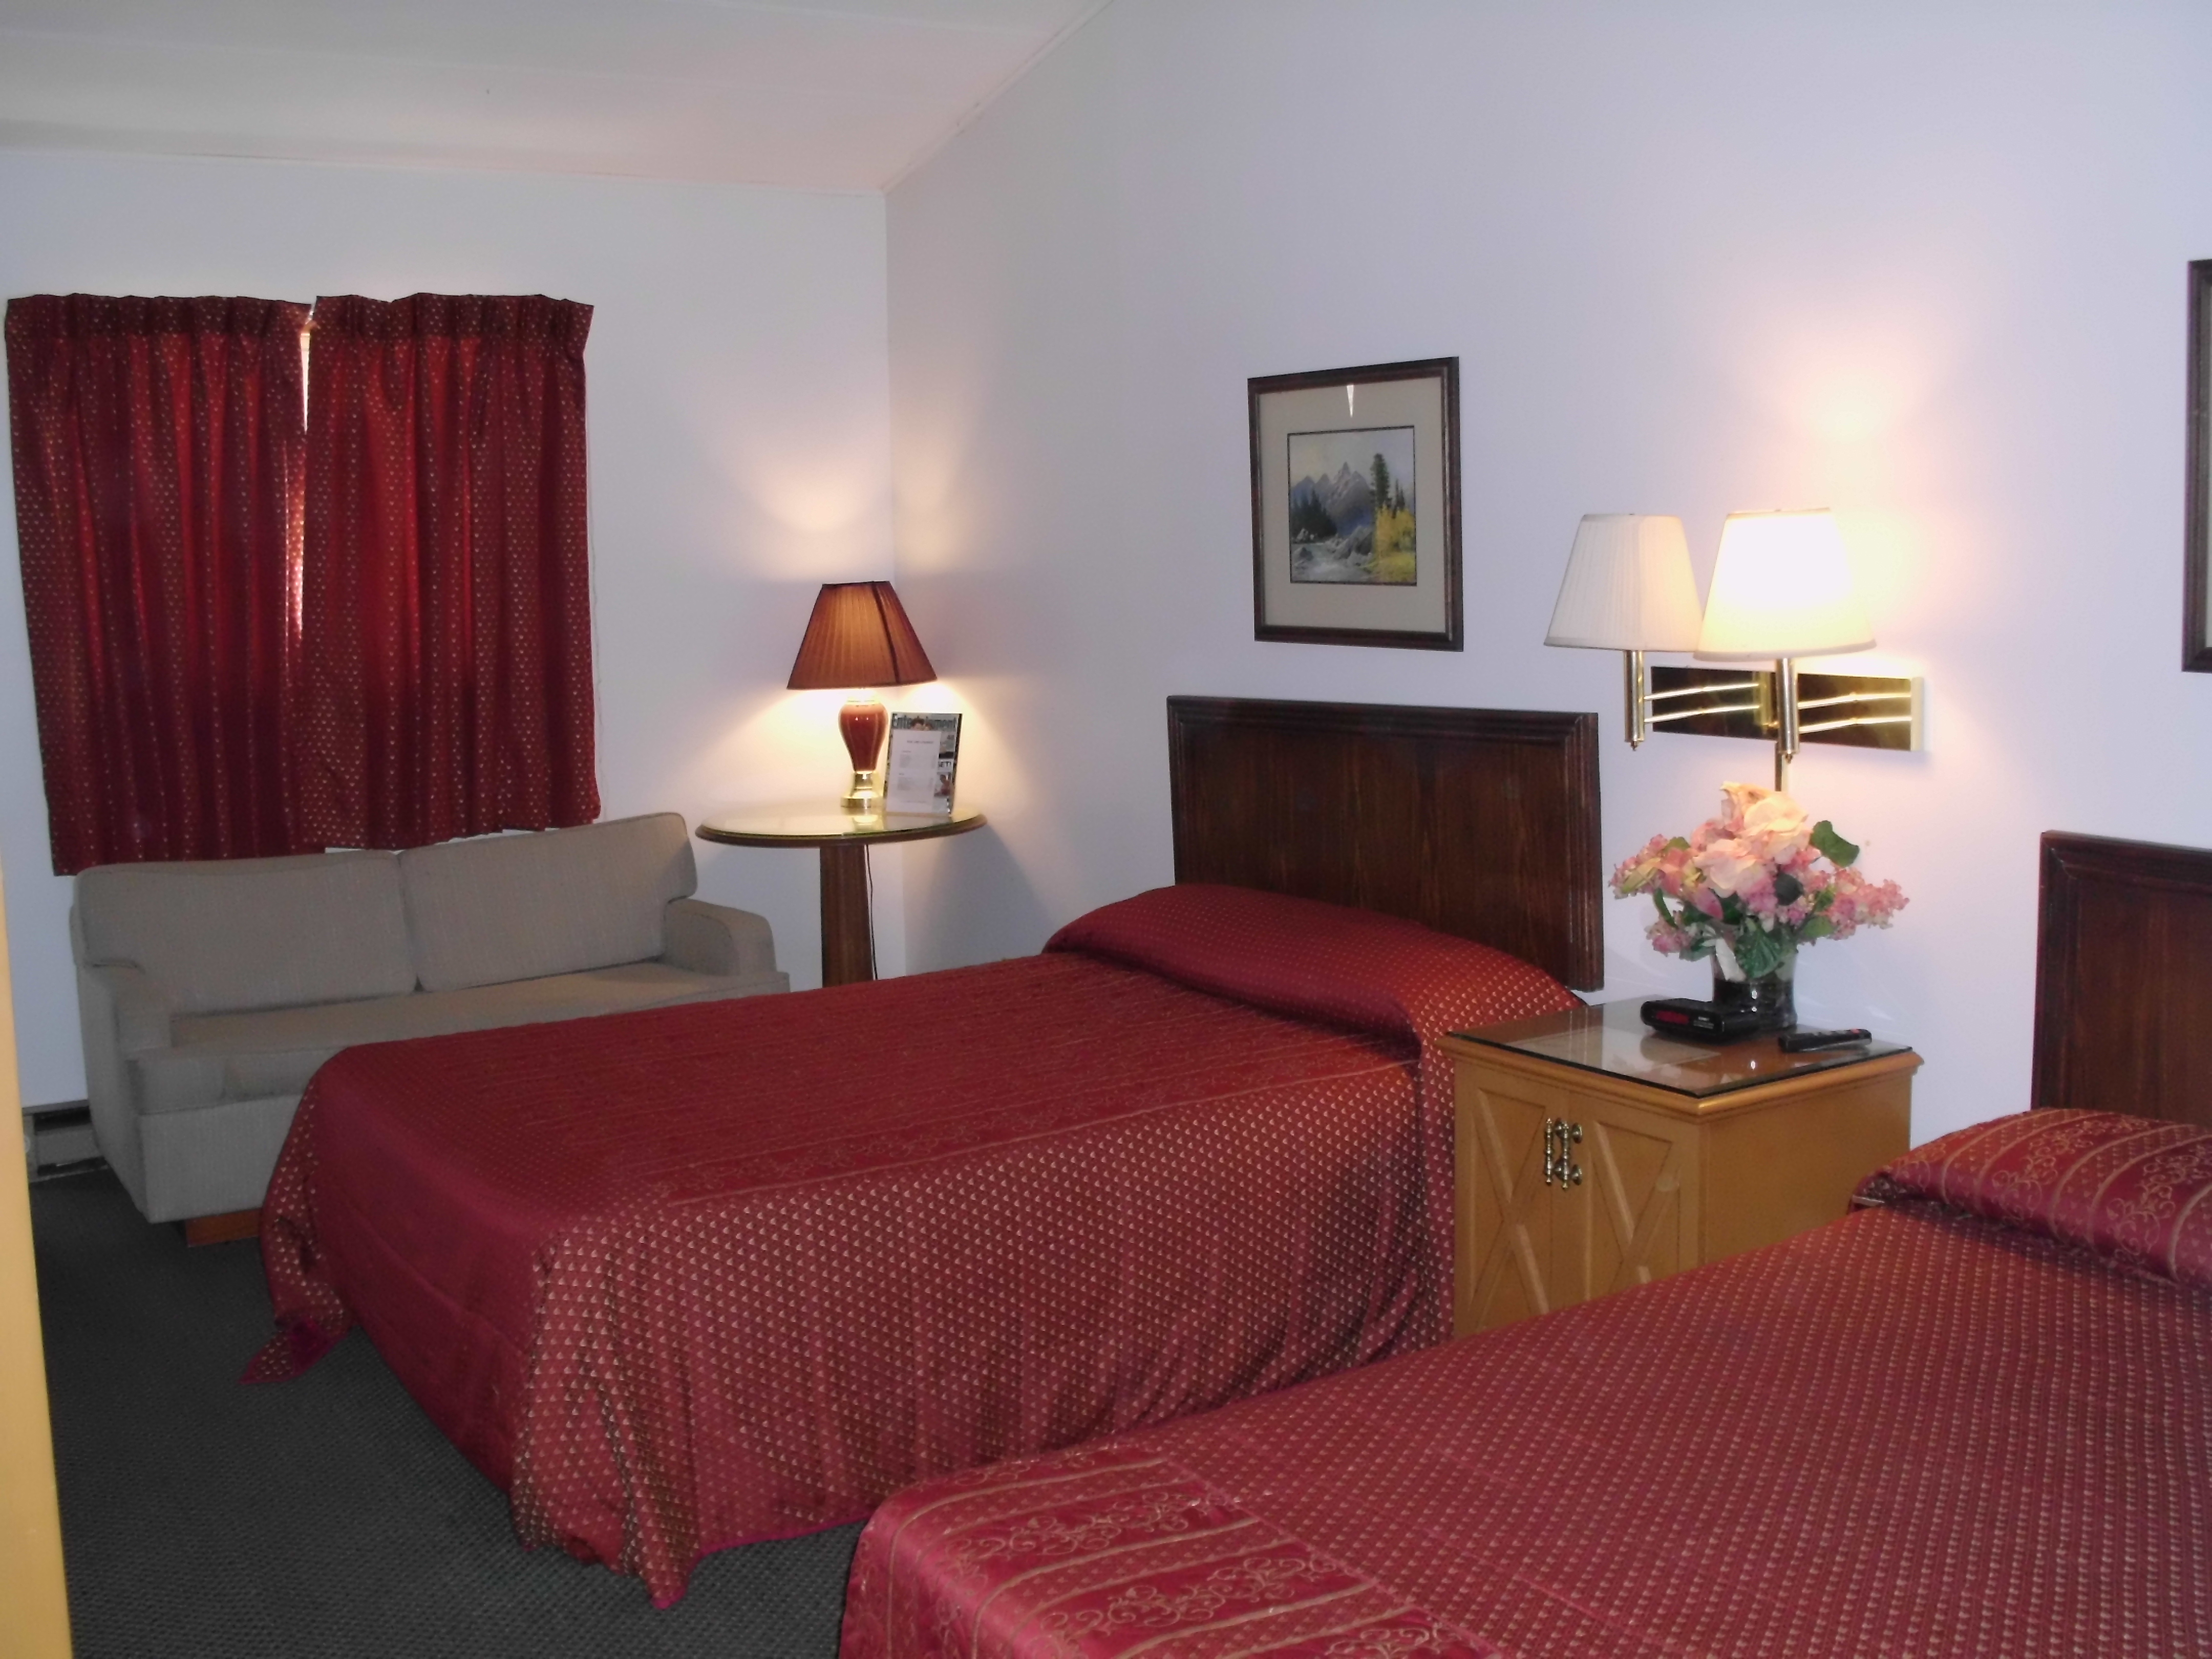 Undewrwood Motel, Underwood IA